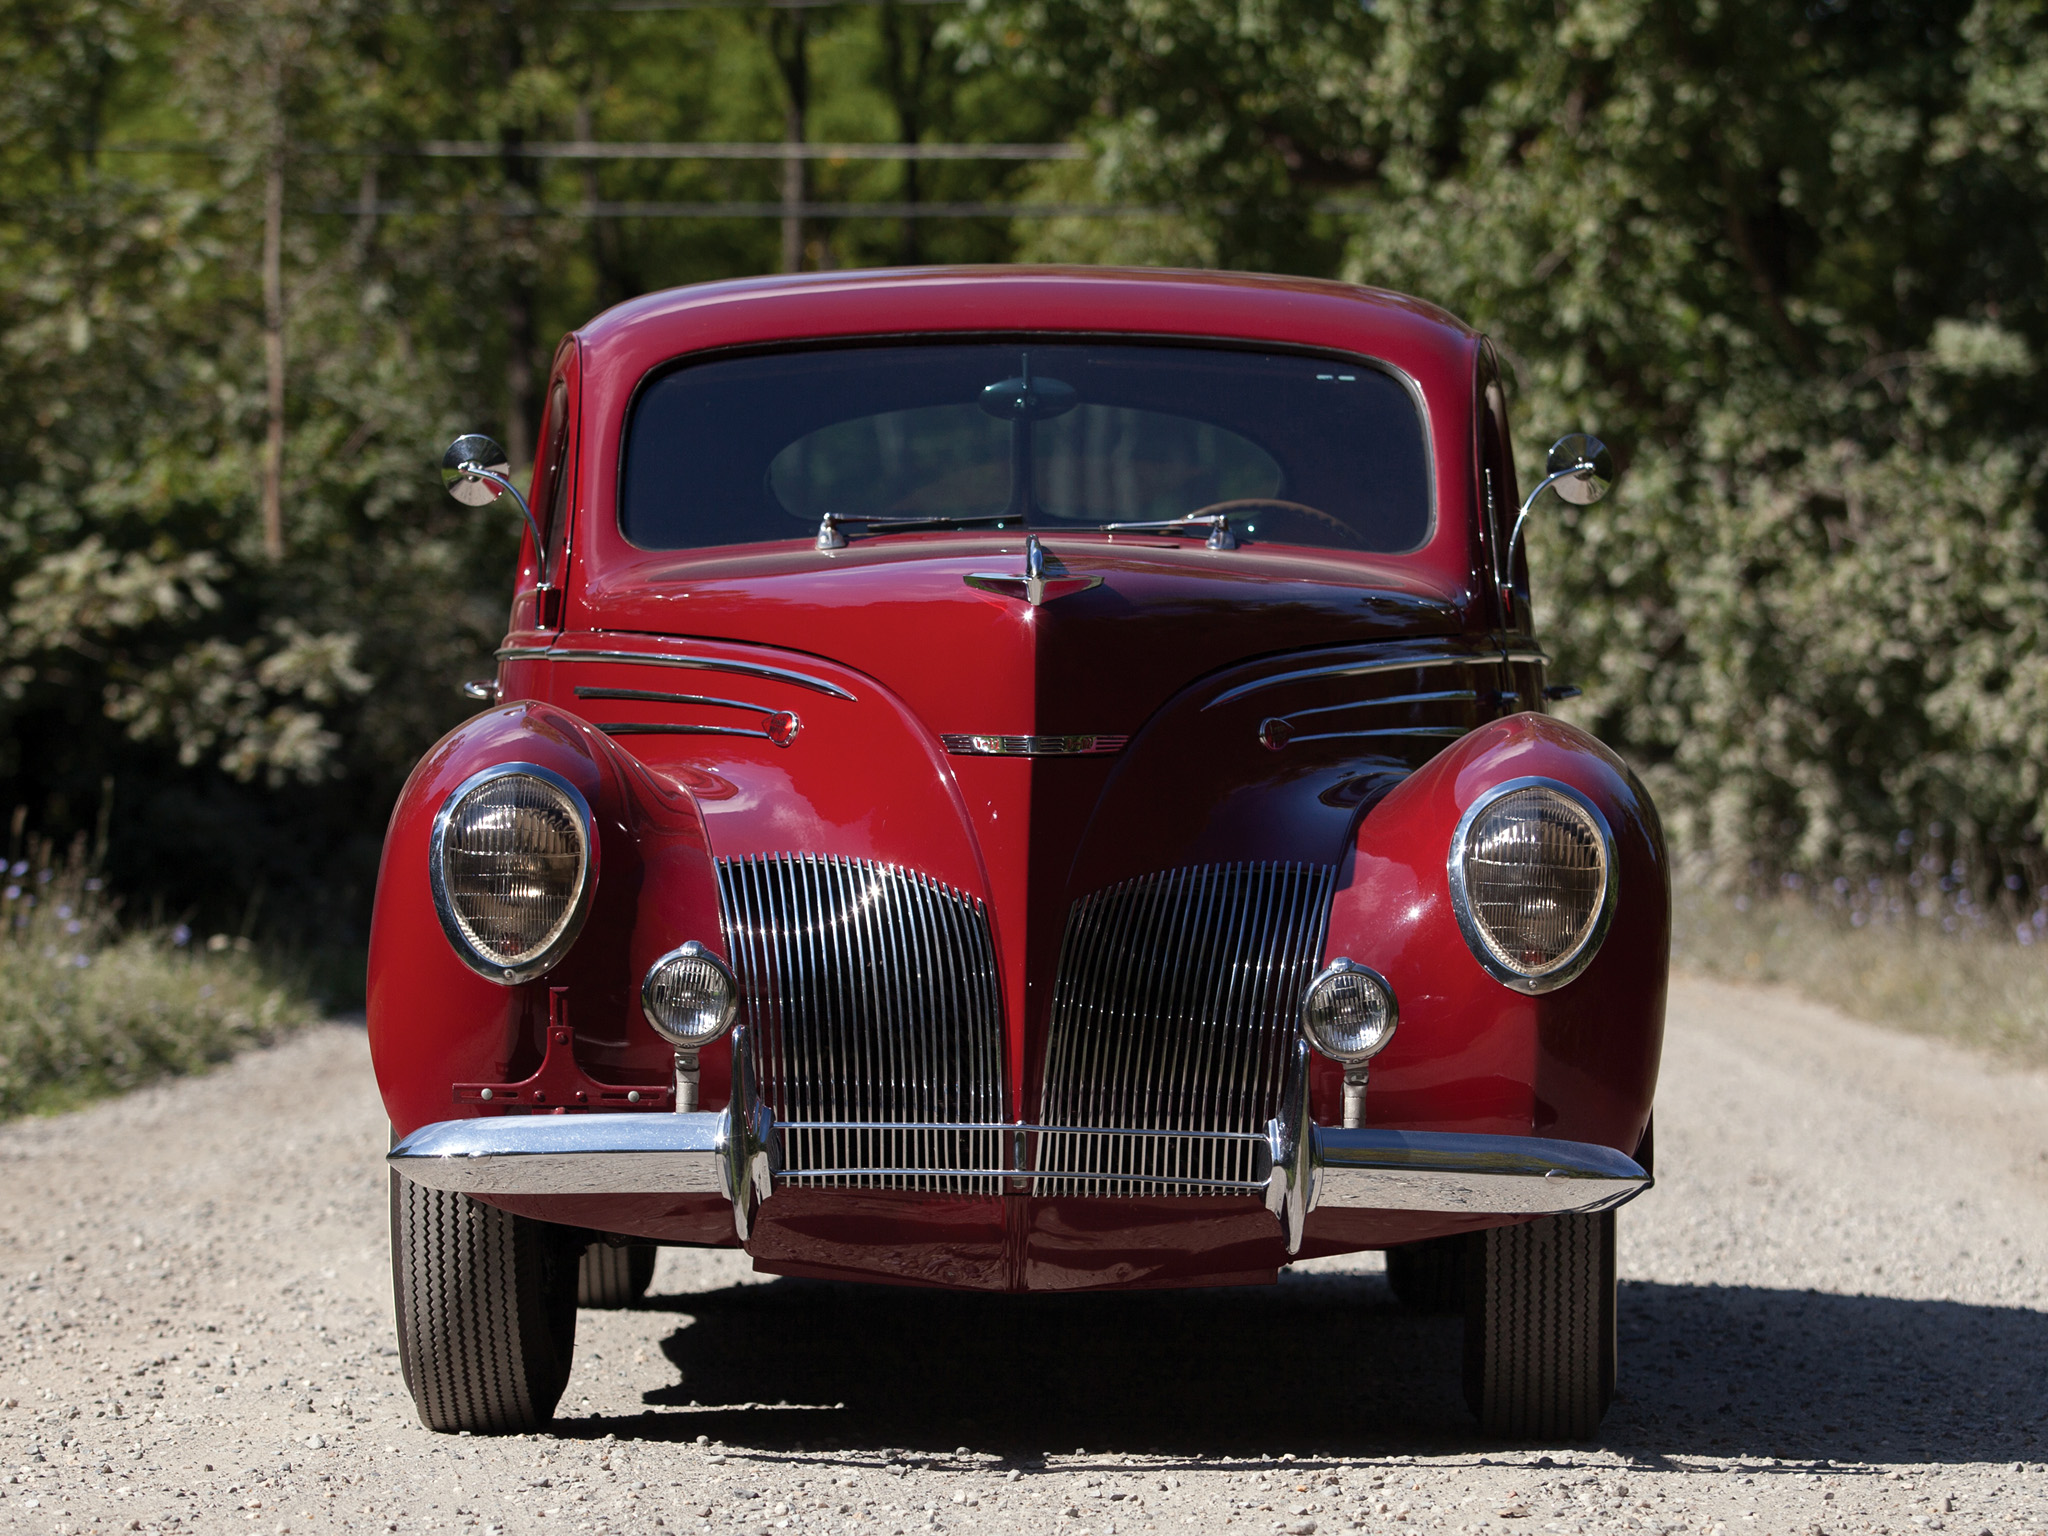 1939, Lincoln, Zephyr, Coupe, H 72, Retro Wallpaper